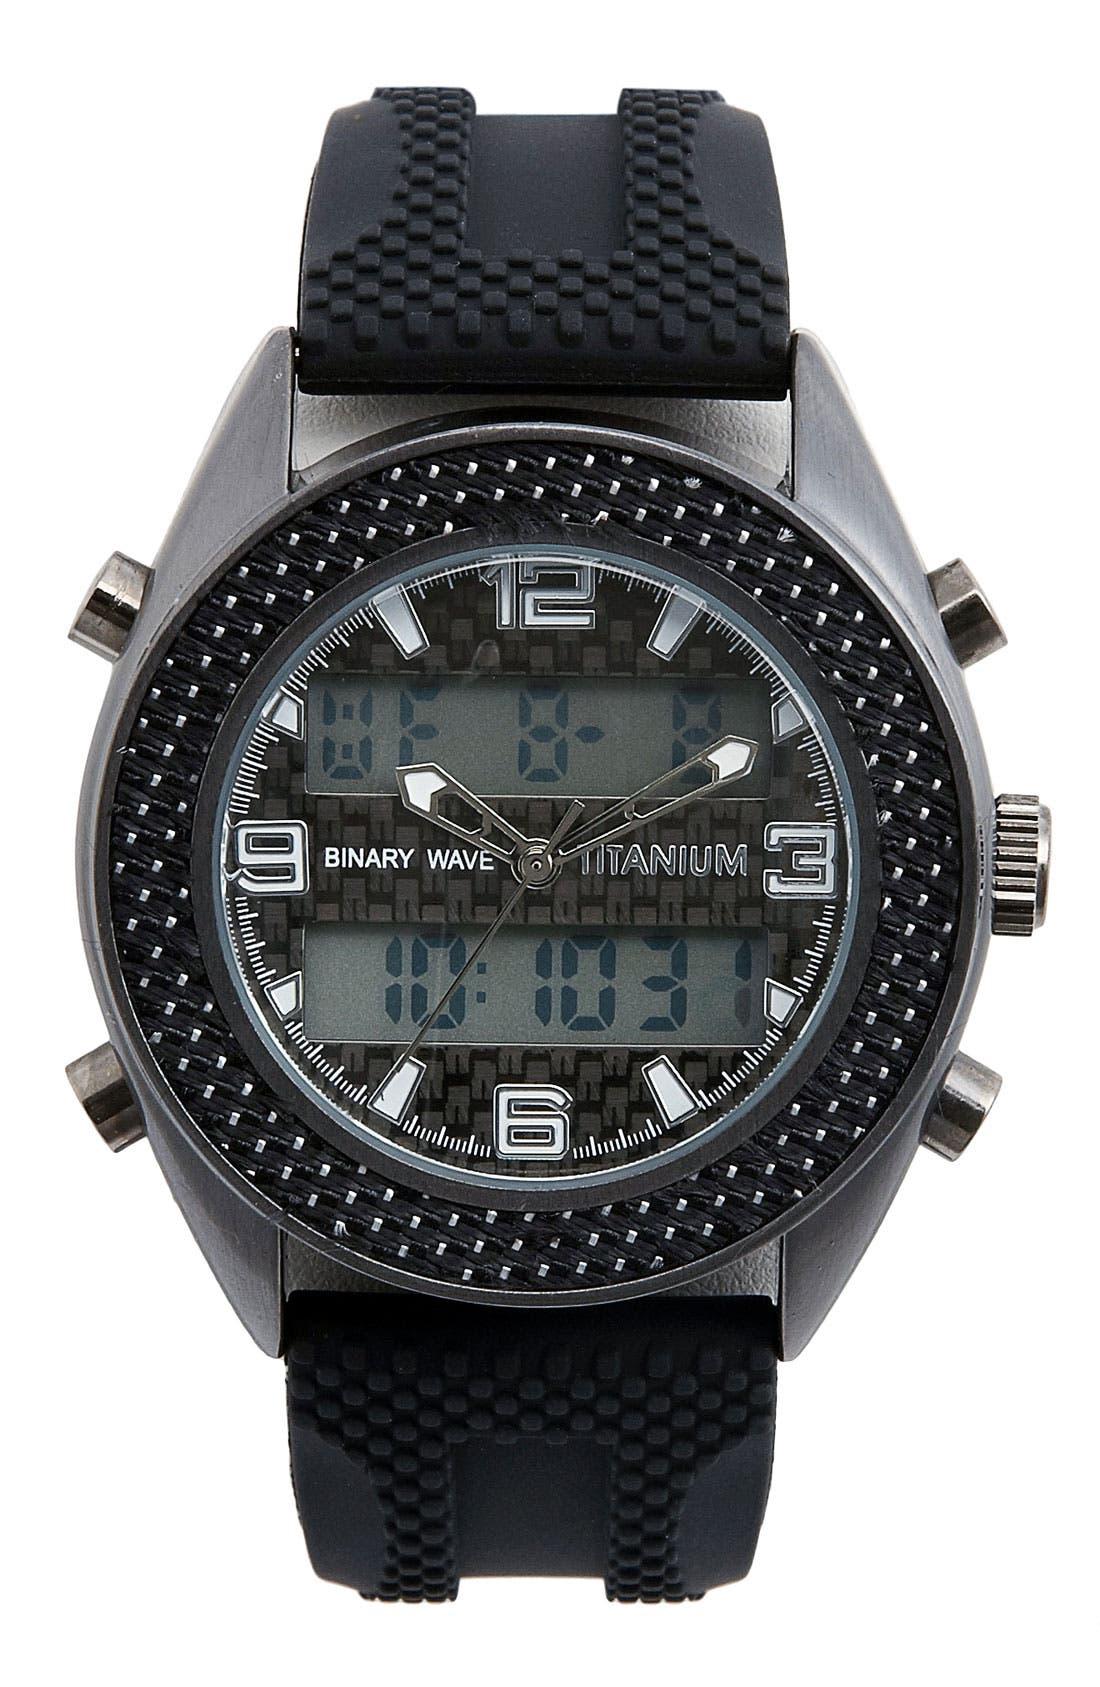 Main Image - Titanium 'Binary Wave' Chronograph Silicone Strap Watch